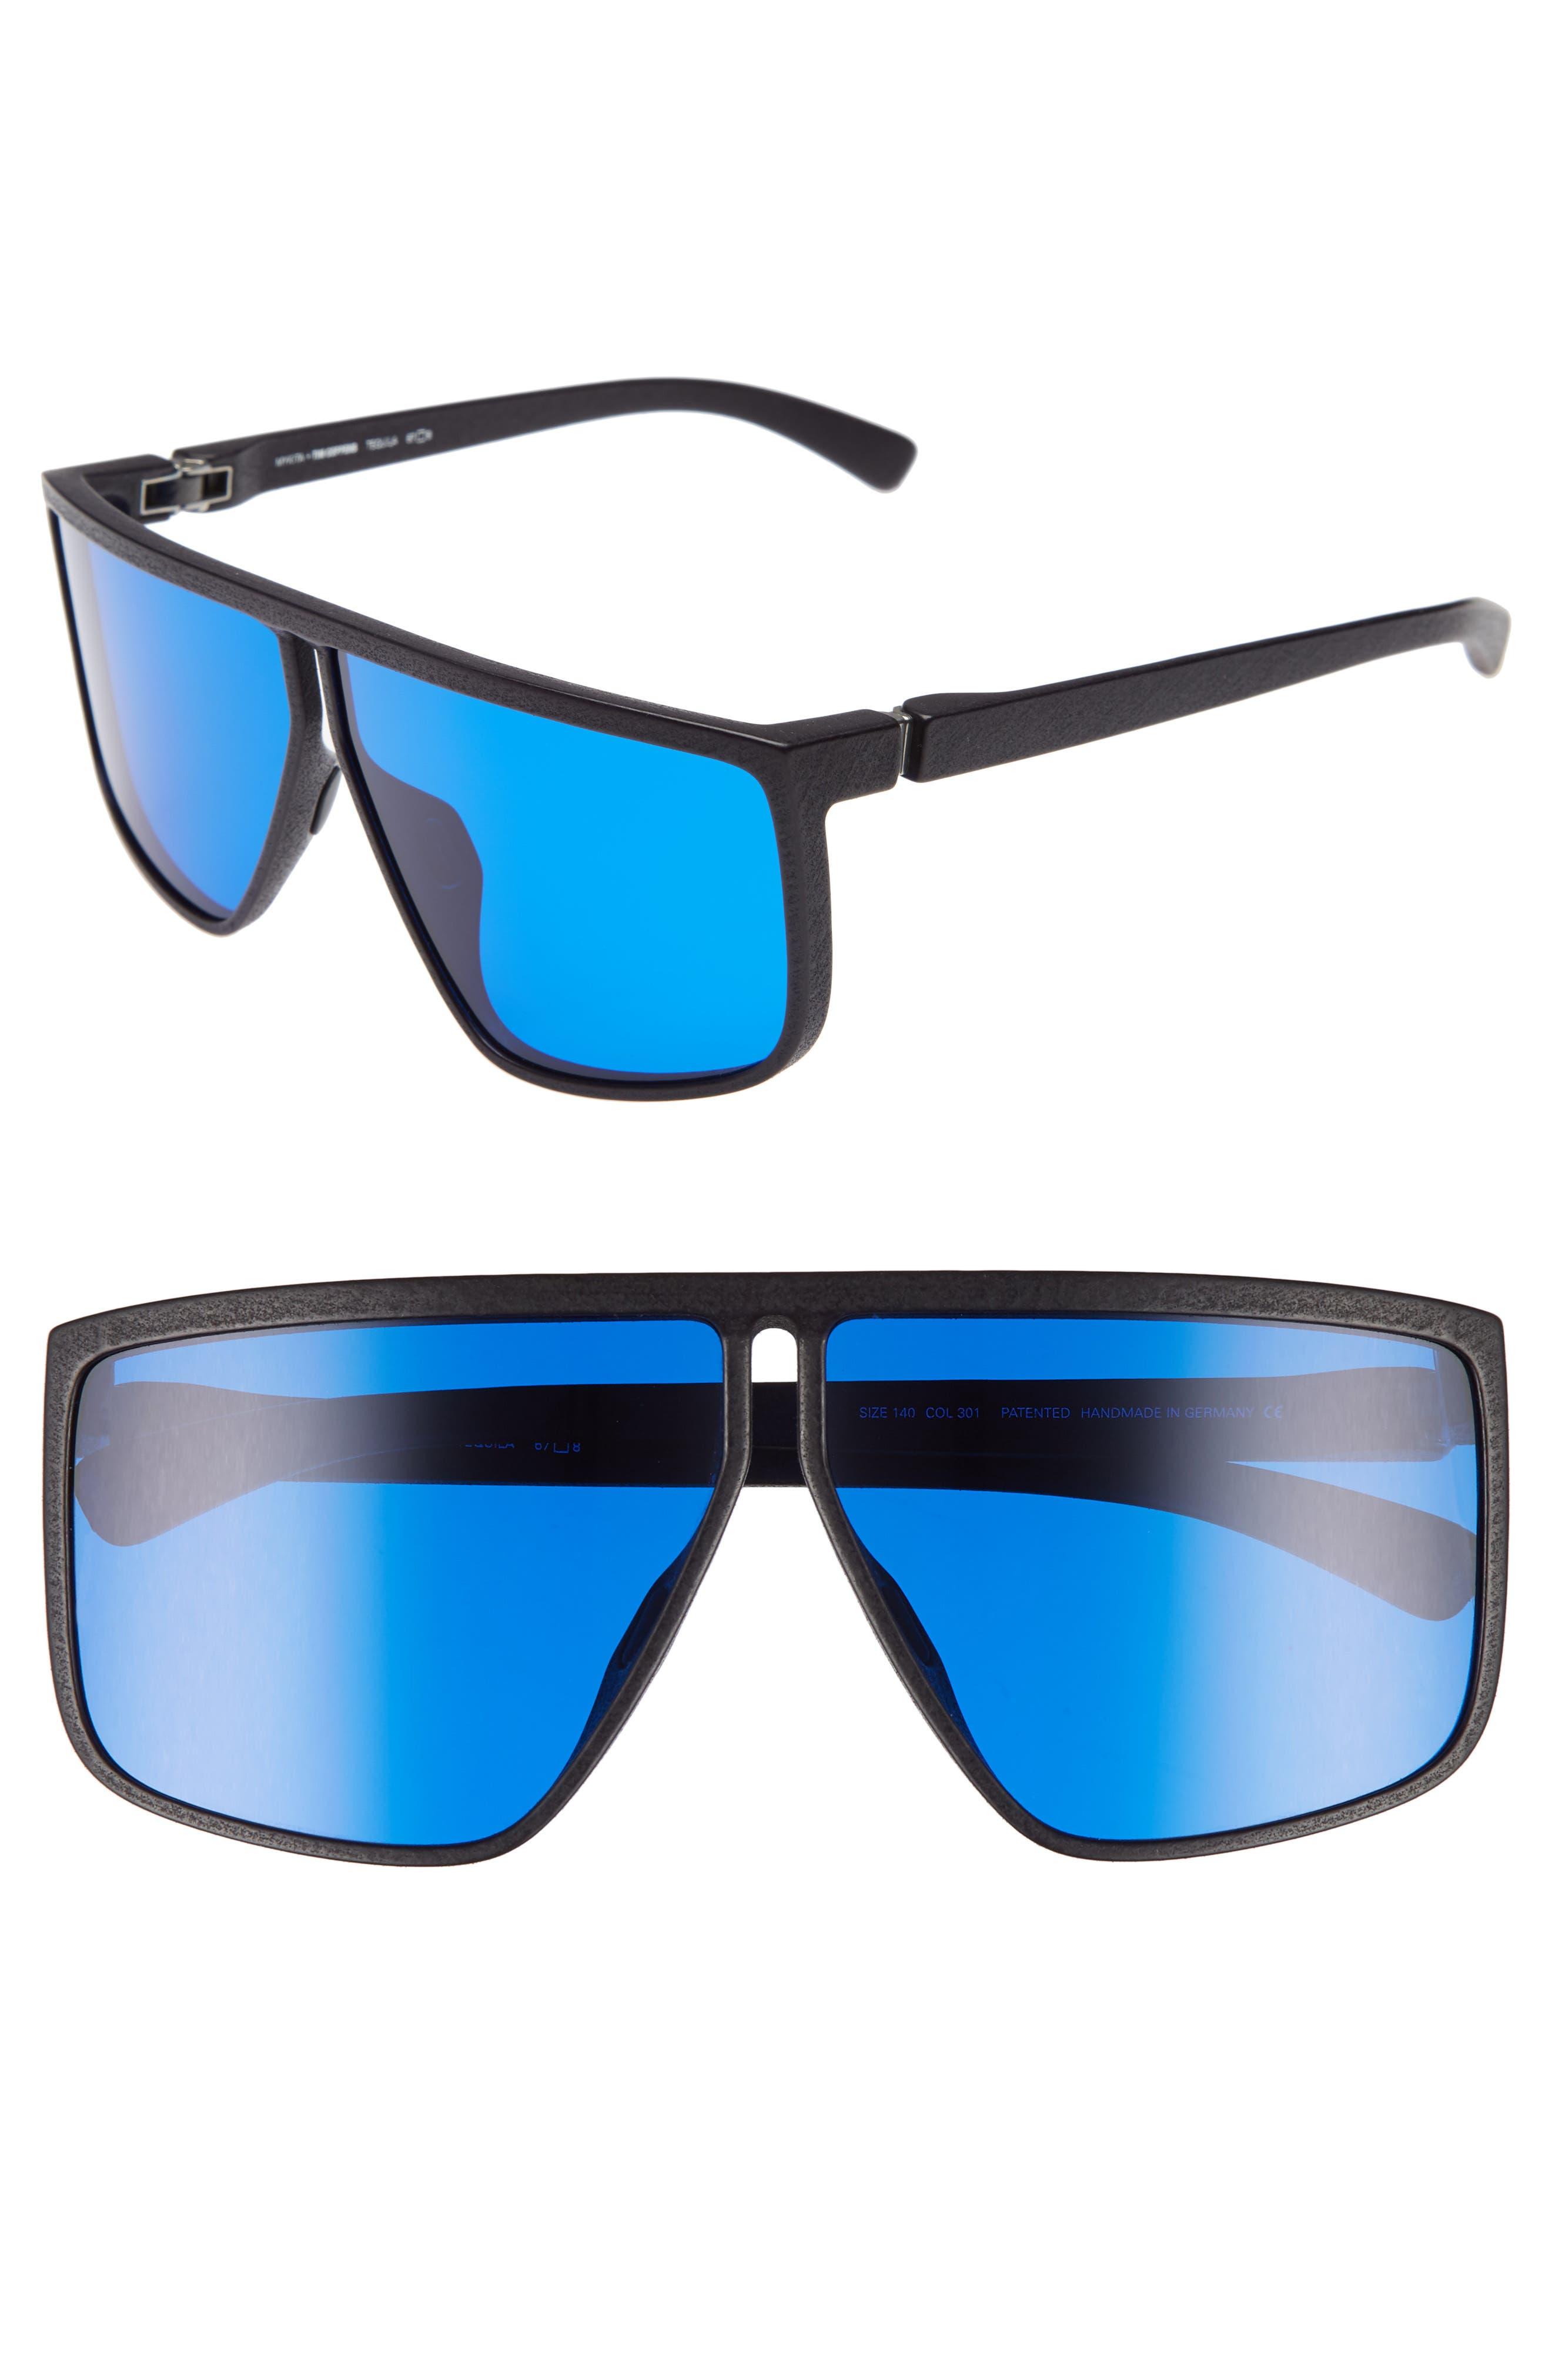 Tequila 67mm Sunglasses,                             Main thumbnail 1, color,                             001